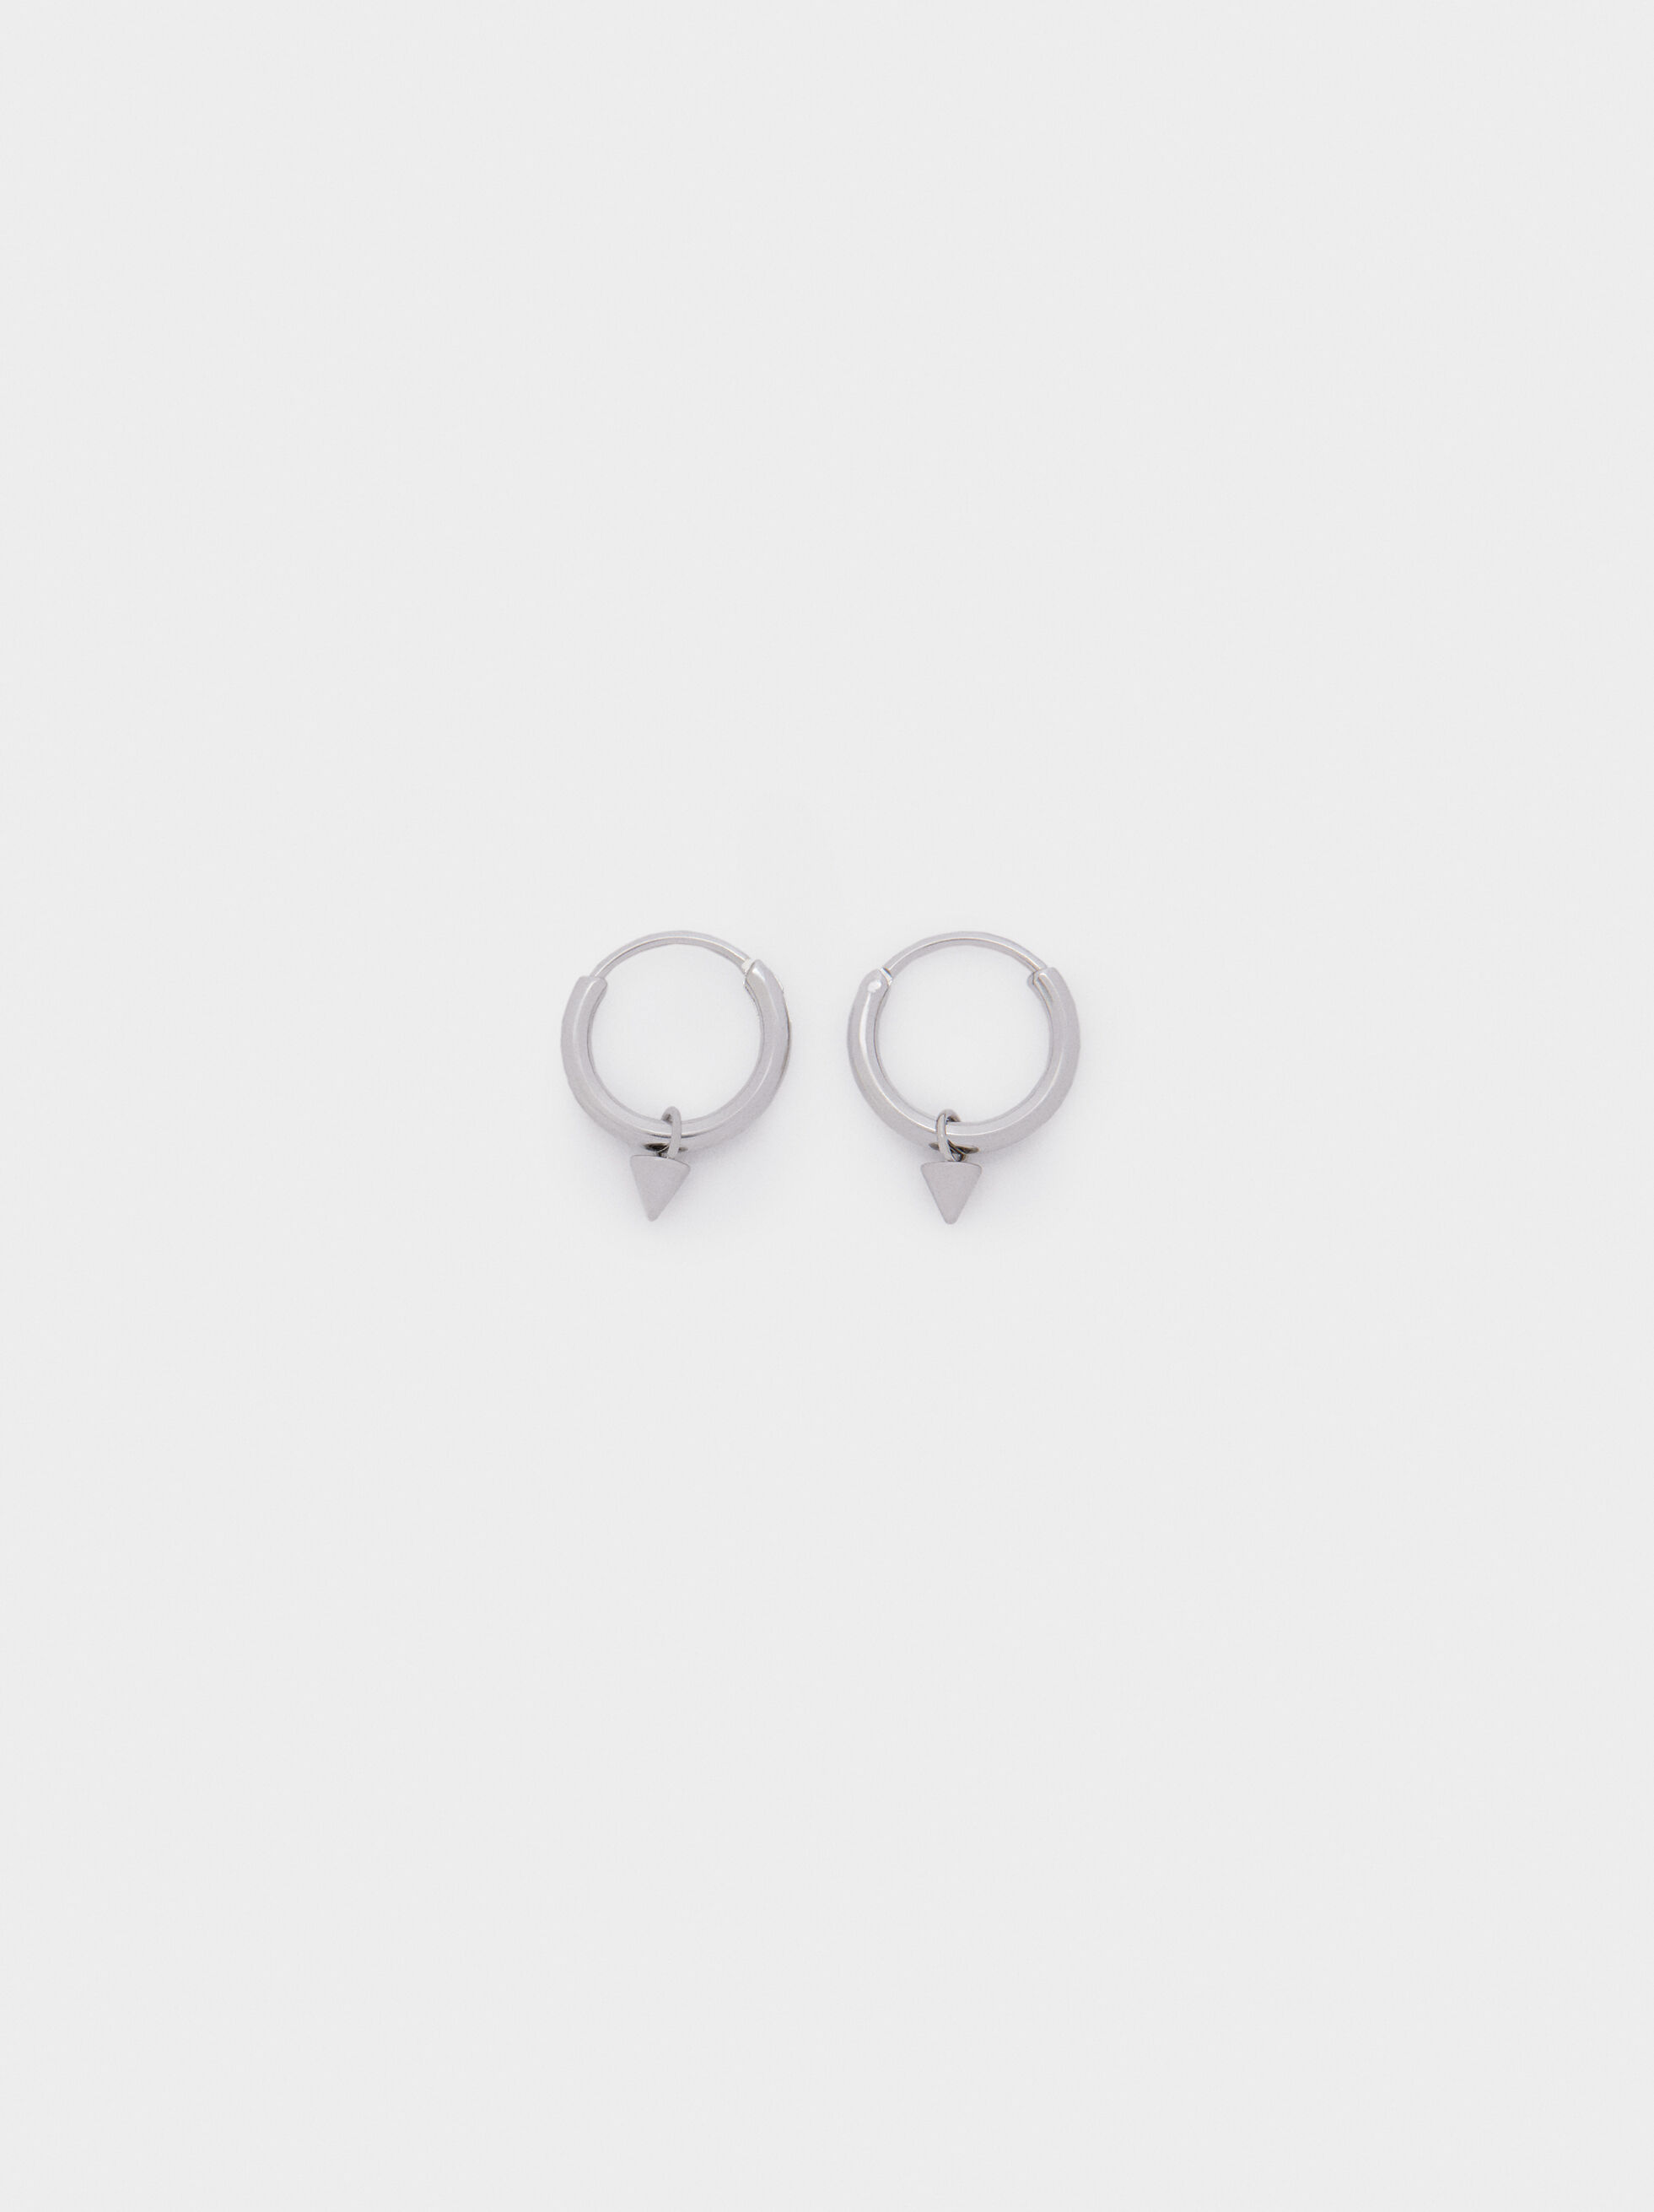 Silver Stainless Steel Short Earrings, Silver, hi-res